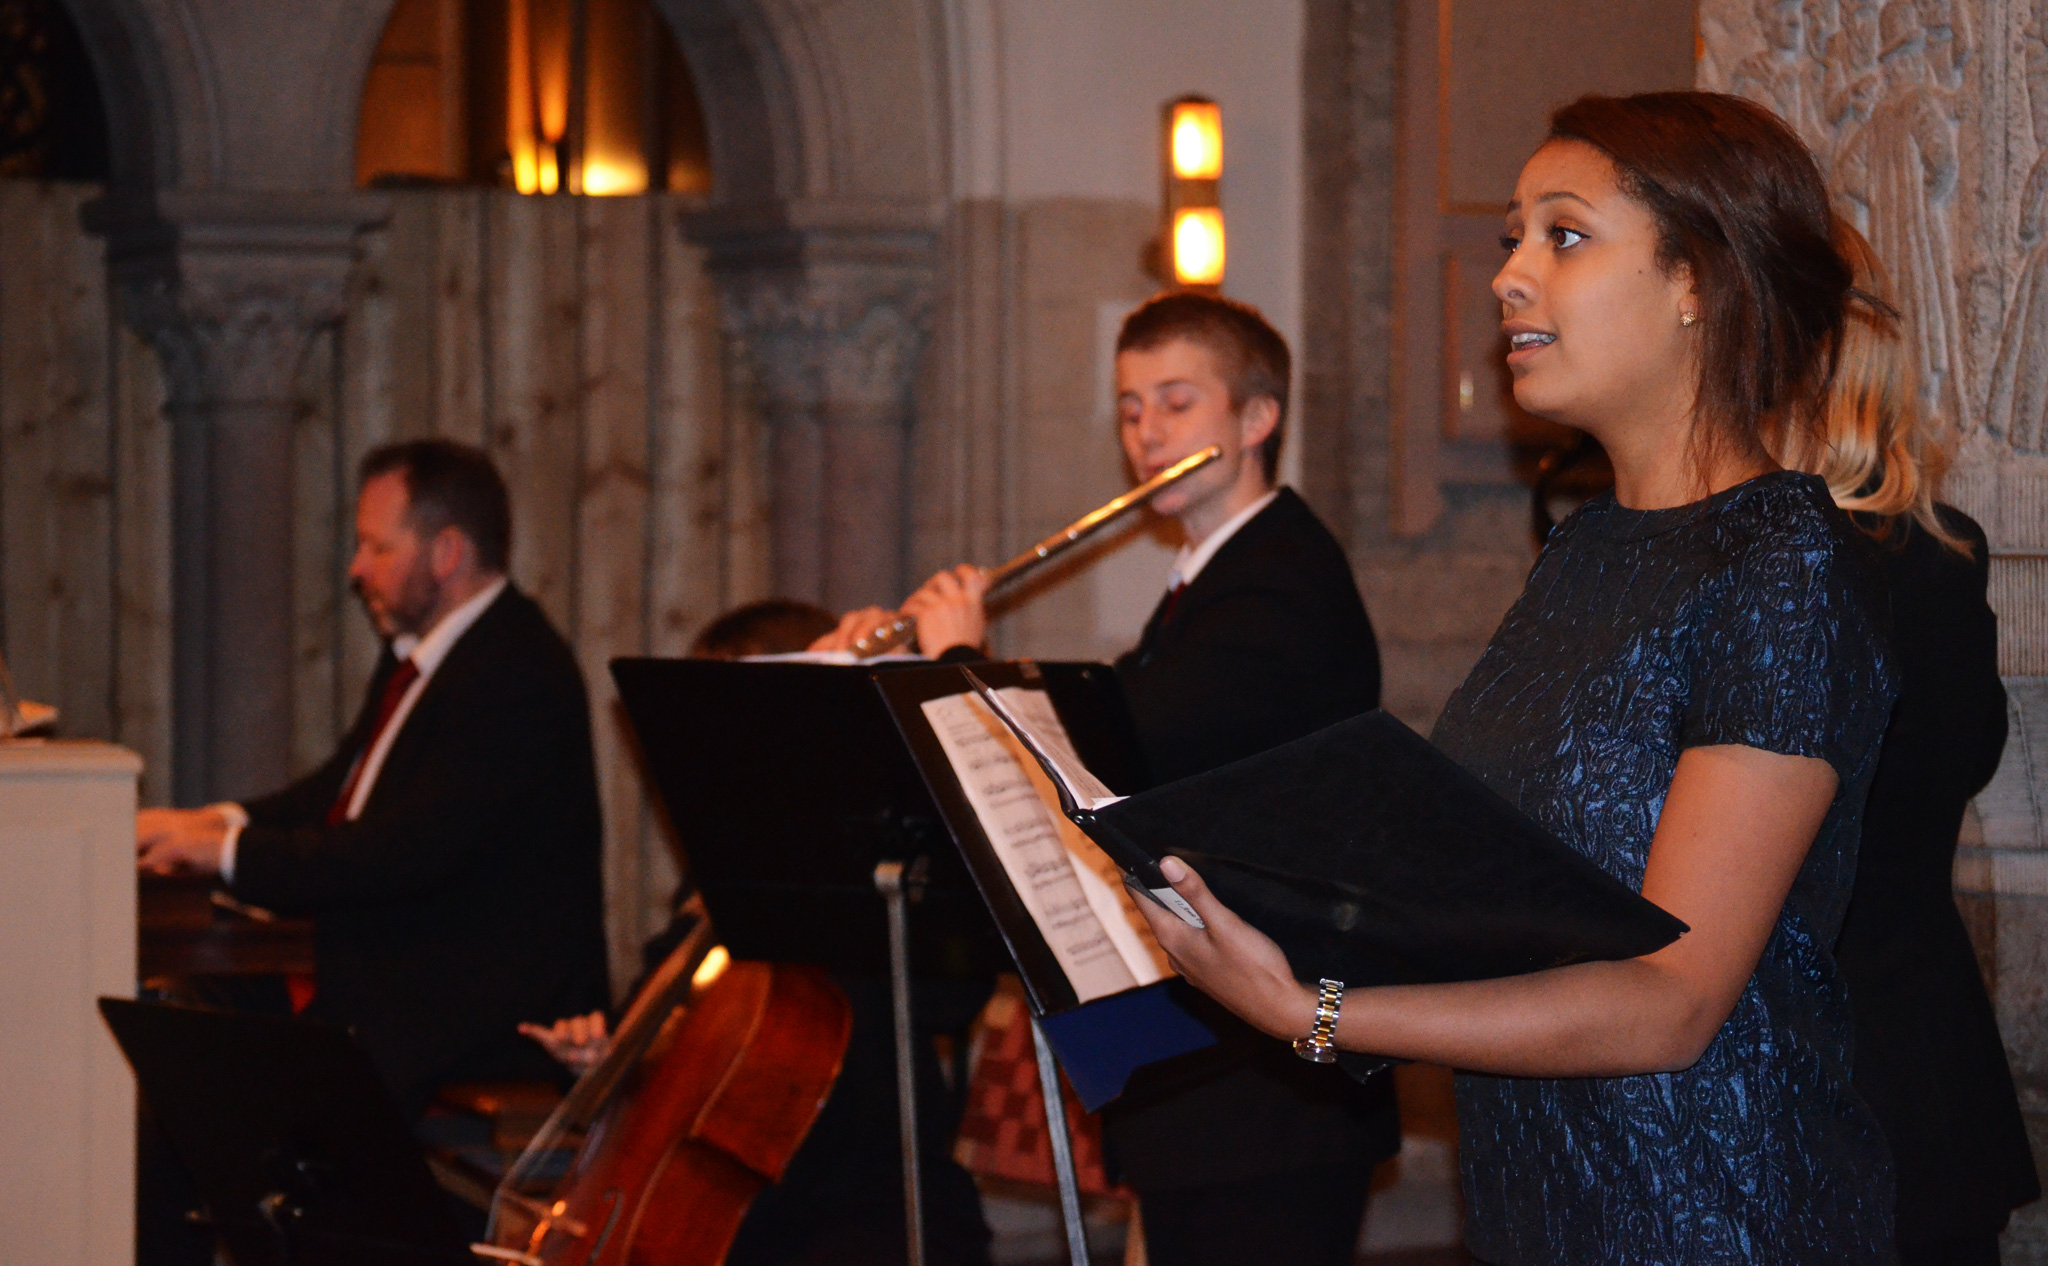 Julkonsert Nicolaikyrkan 16/12 2012 - 3